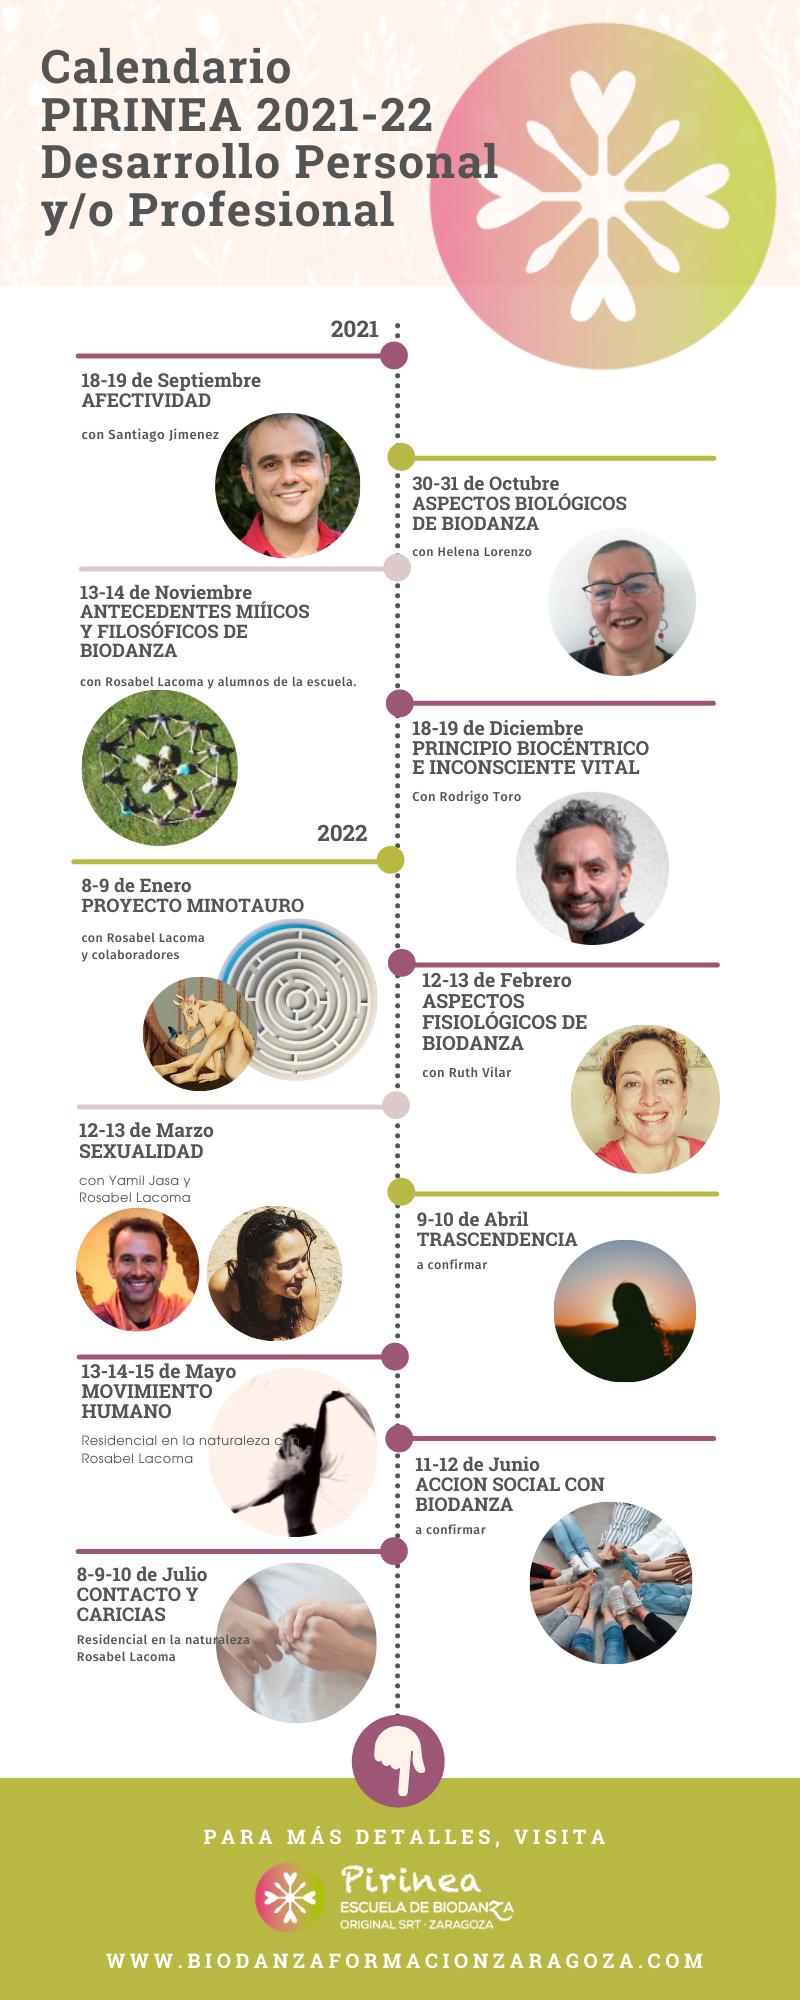 Calendario 2021-22 Biodanza Pirinea